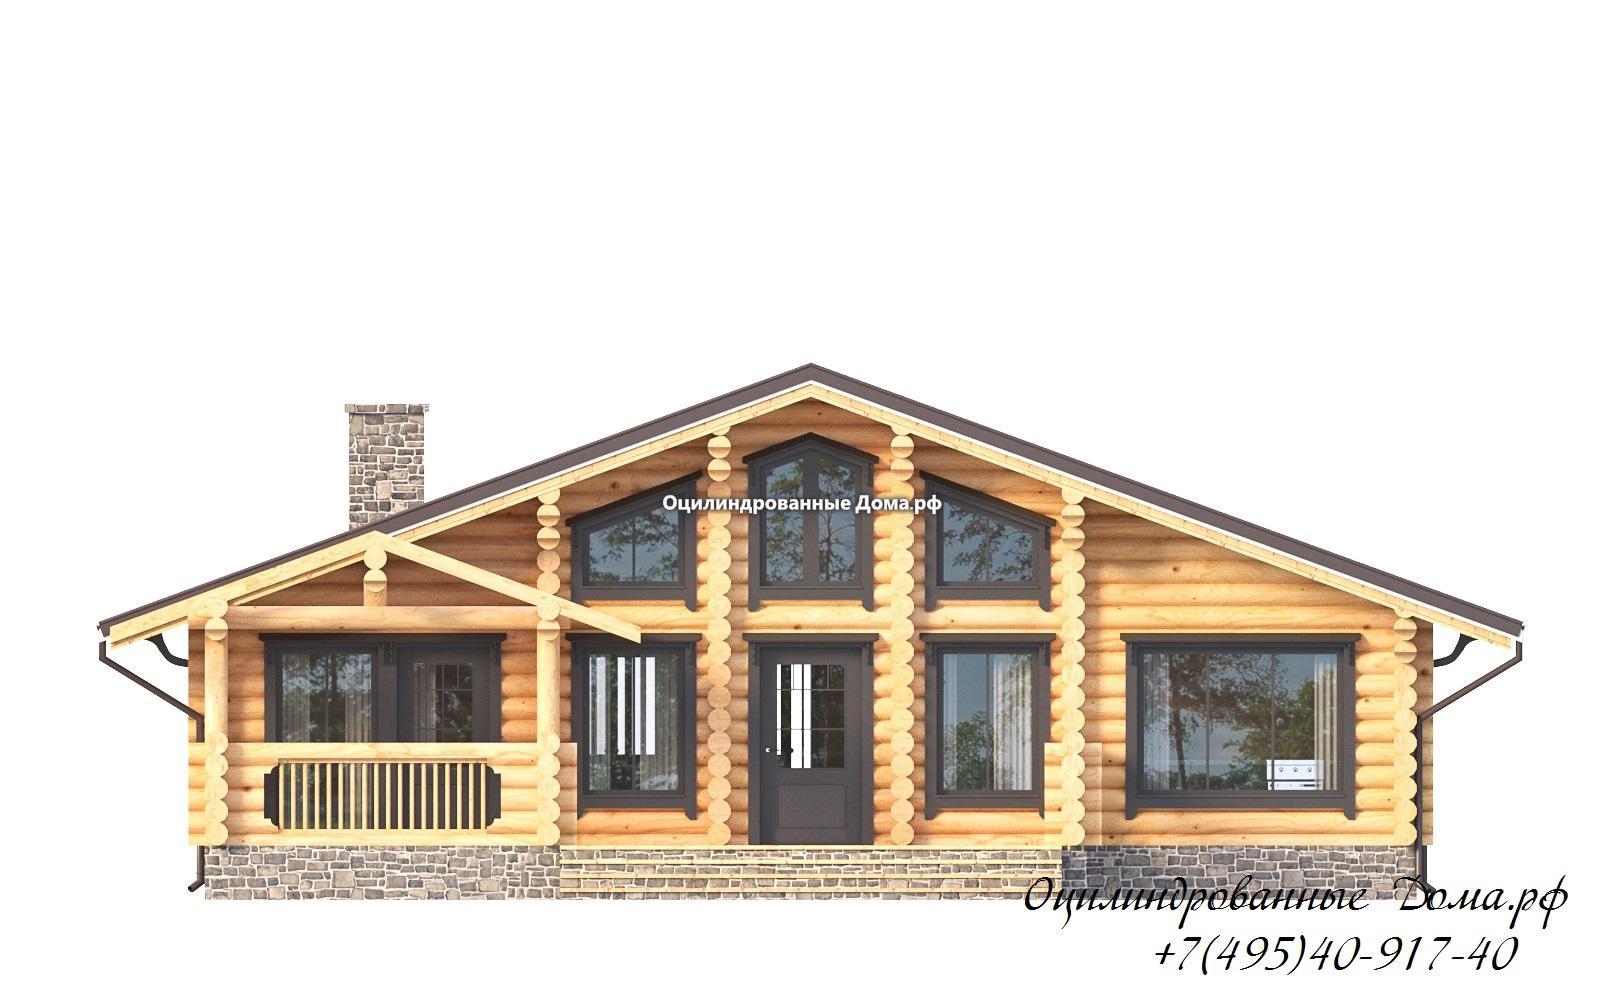 фасад 3 дома из оцилиндрованного бревна в стиле шале Монблан - 125м2